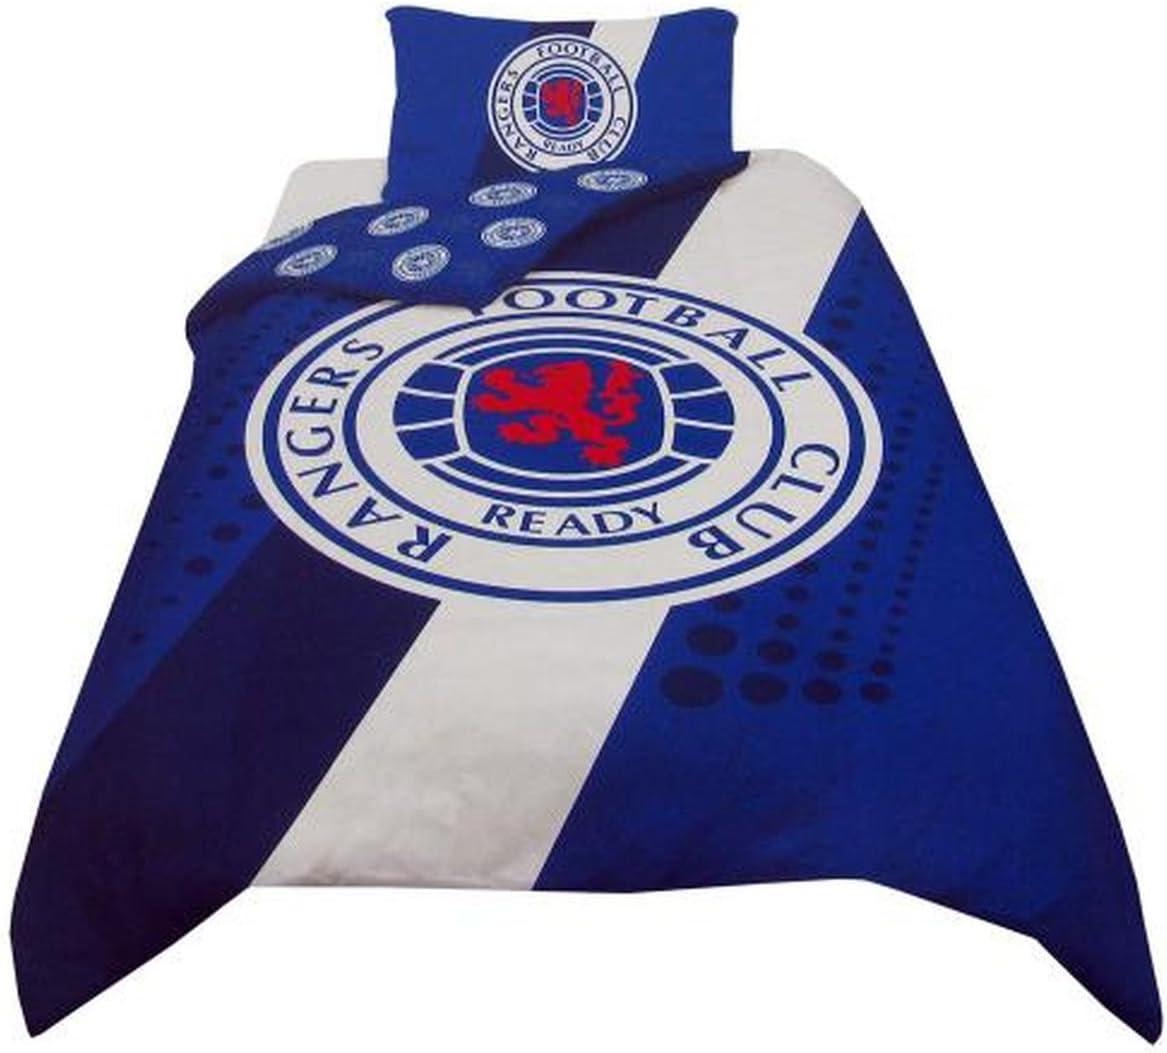 Rangers Fc Stripe Crest Single Duvet Bedding Set Amazon Co Uk Sports Outdoors